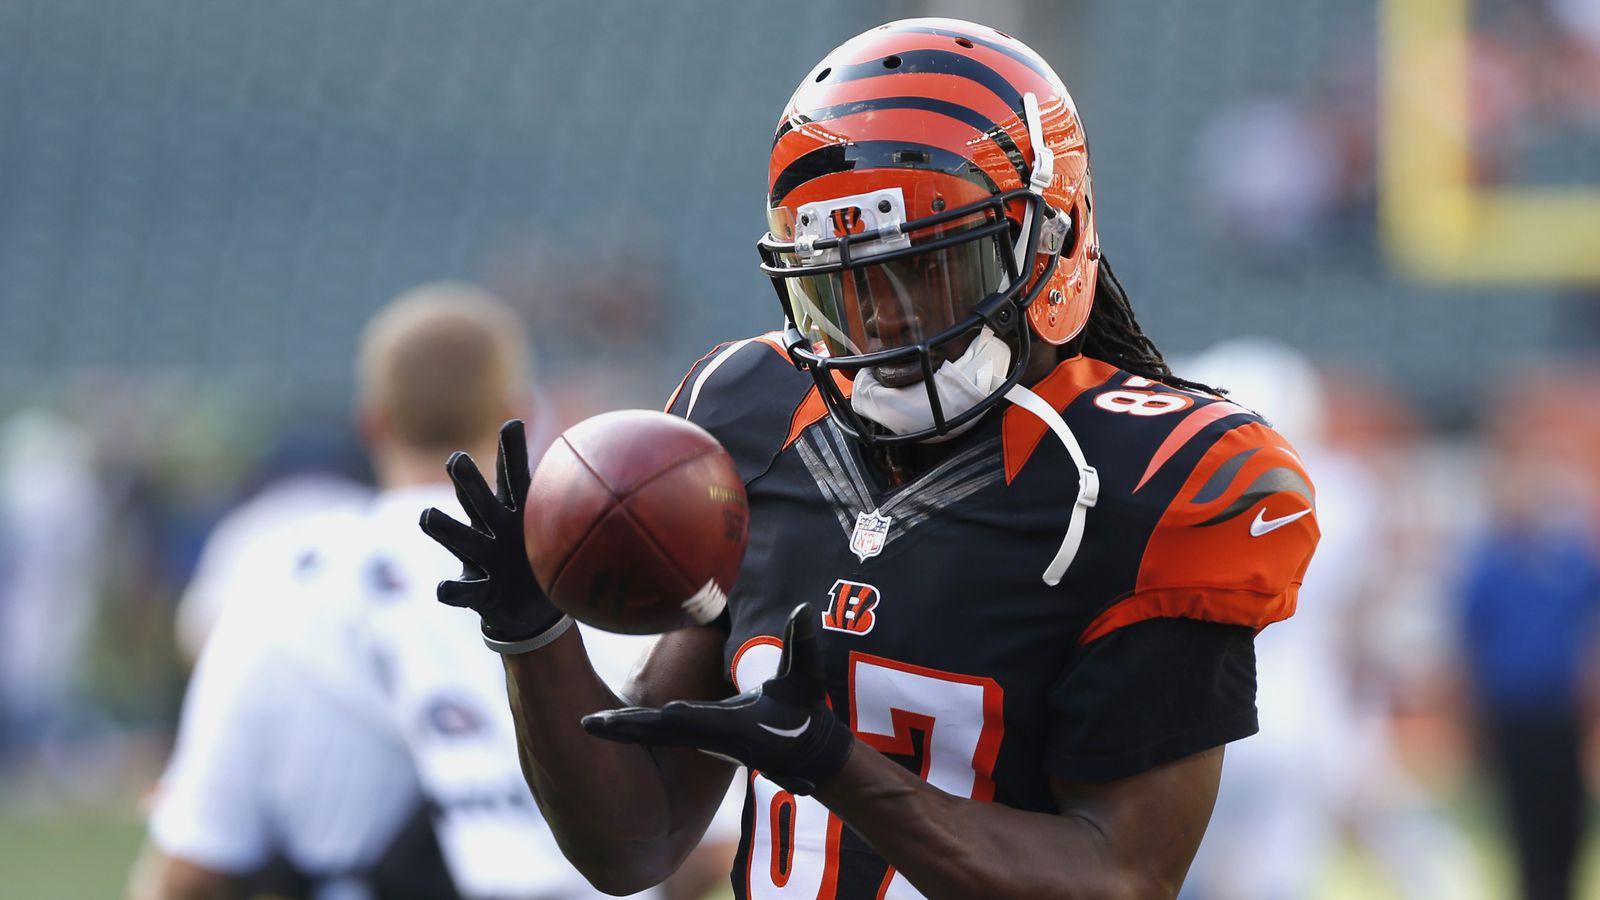 Nike jerseys for Cheap - Cobi Hamilton added to Cincinnati Bengals Practice Squad - Cincy ...